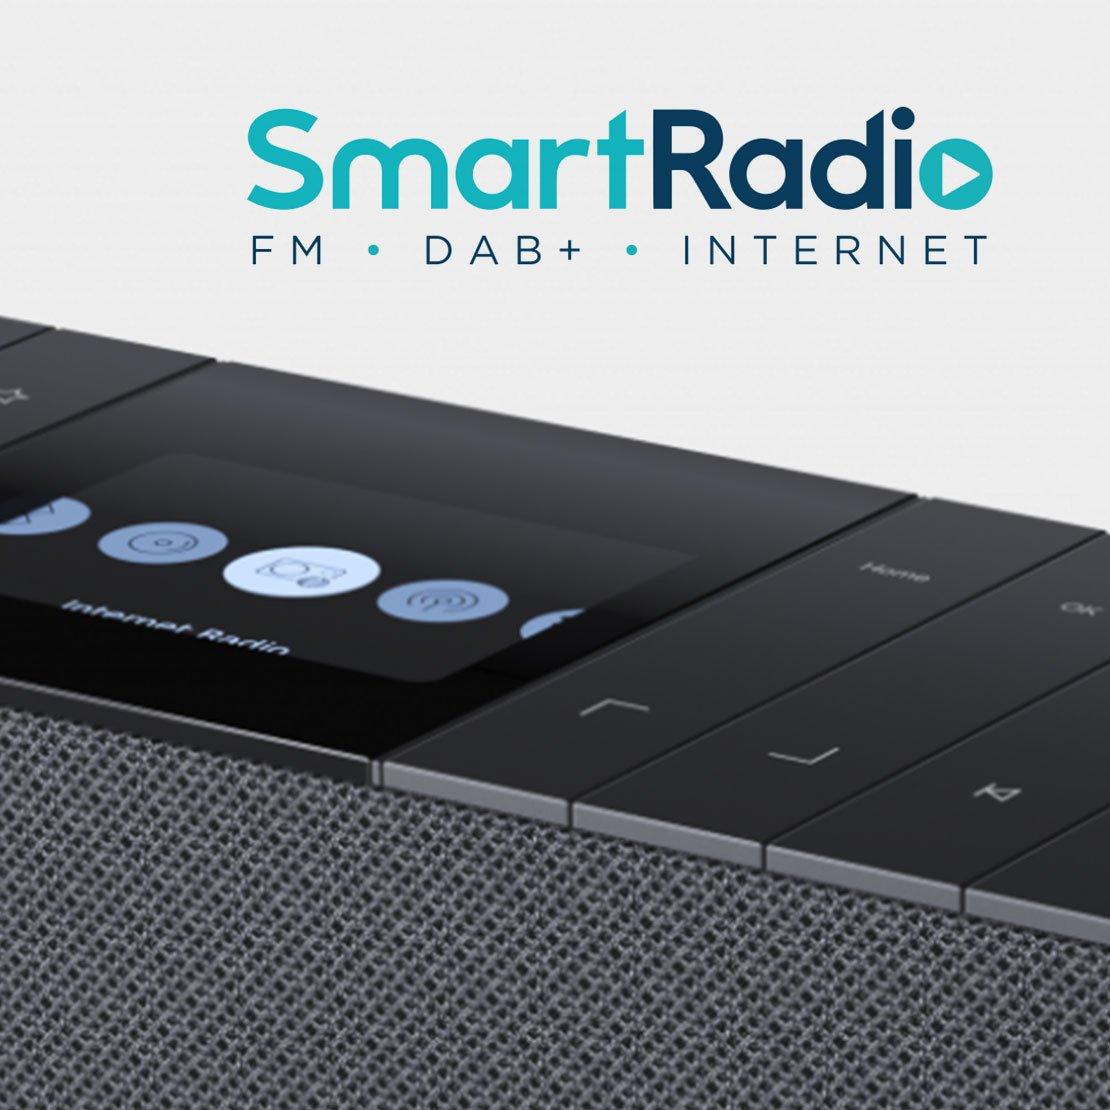 Klang s3 - Radio internetowe i cyfrowe DAB+